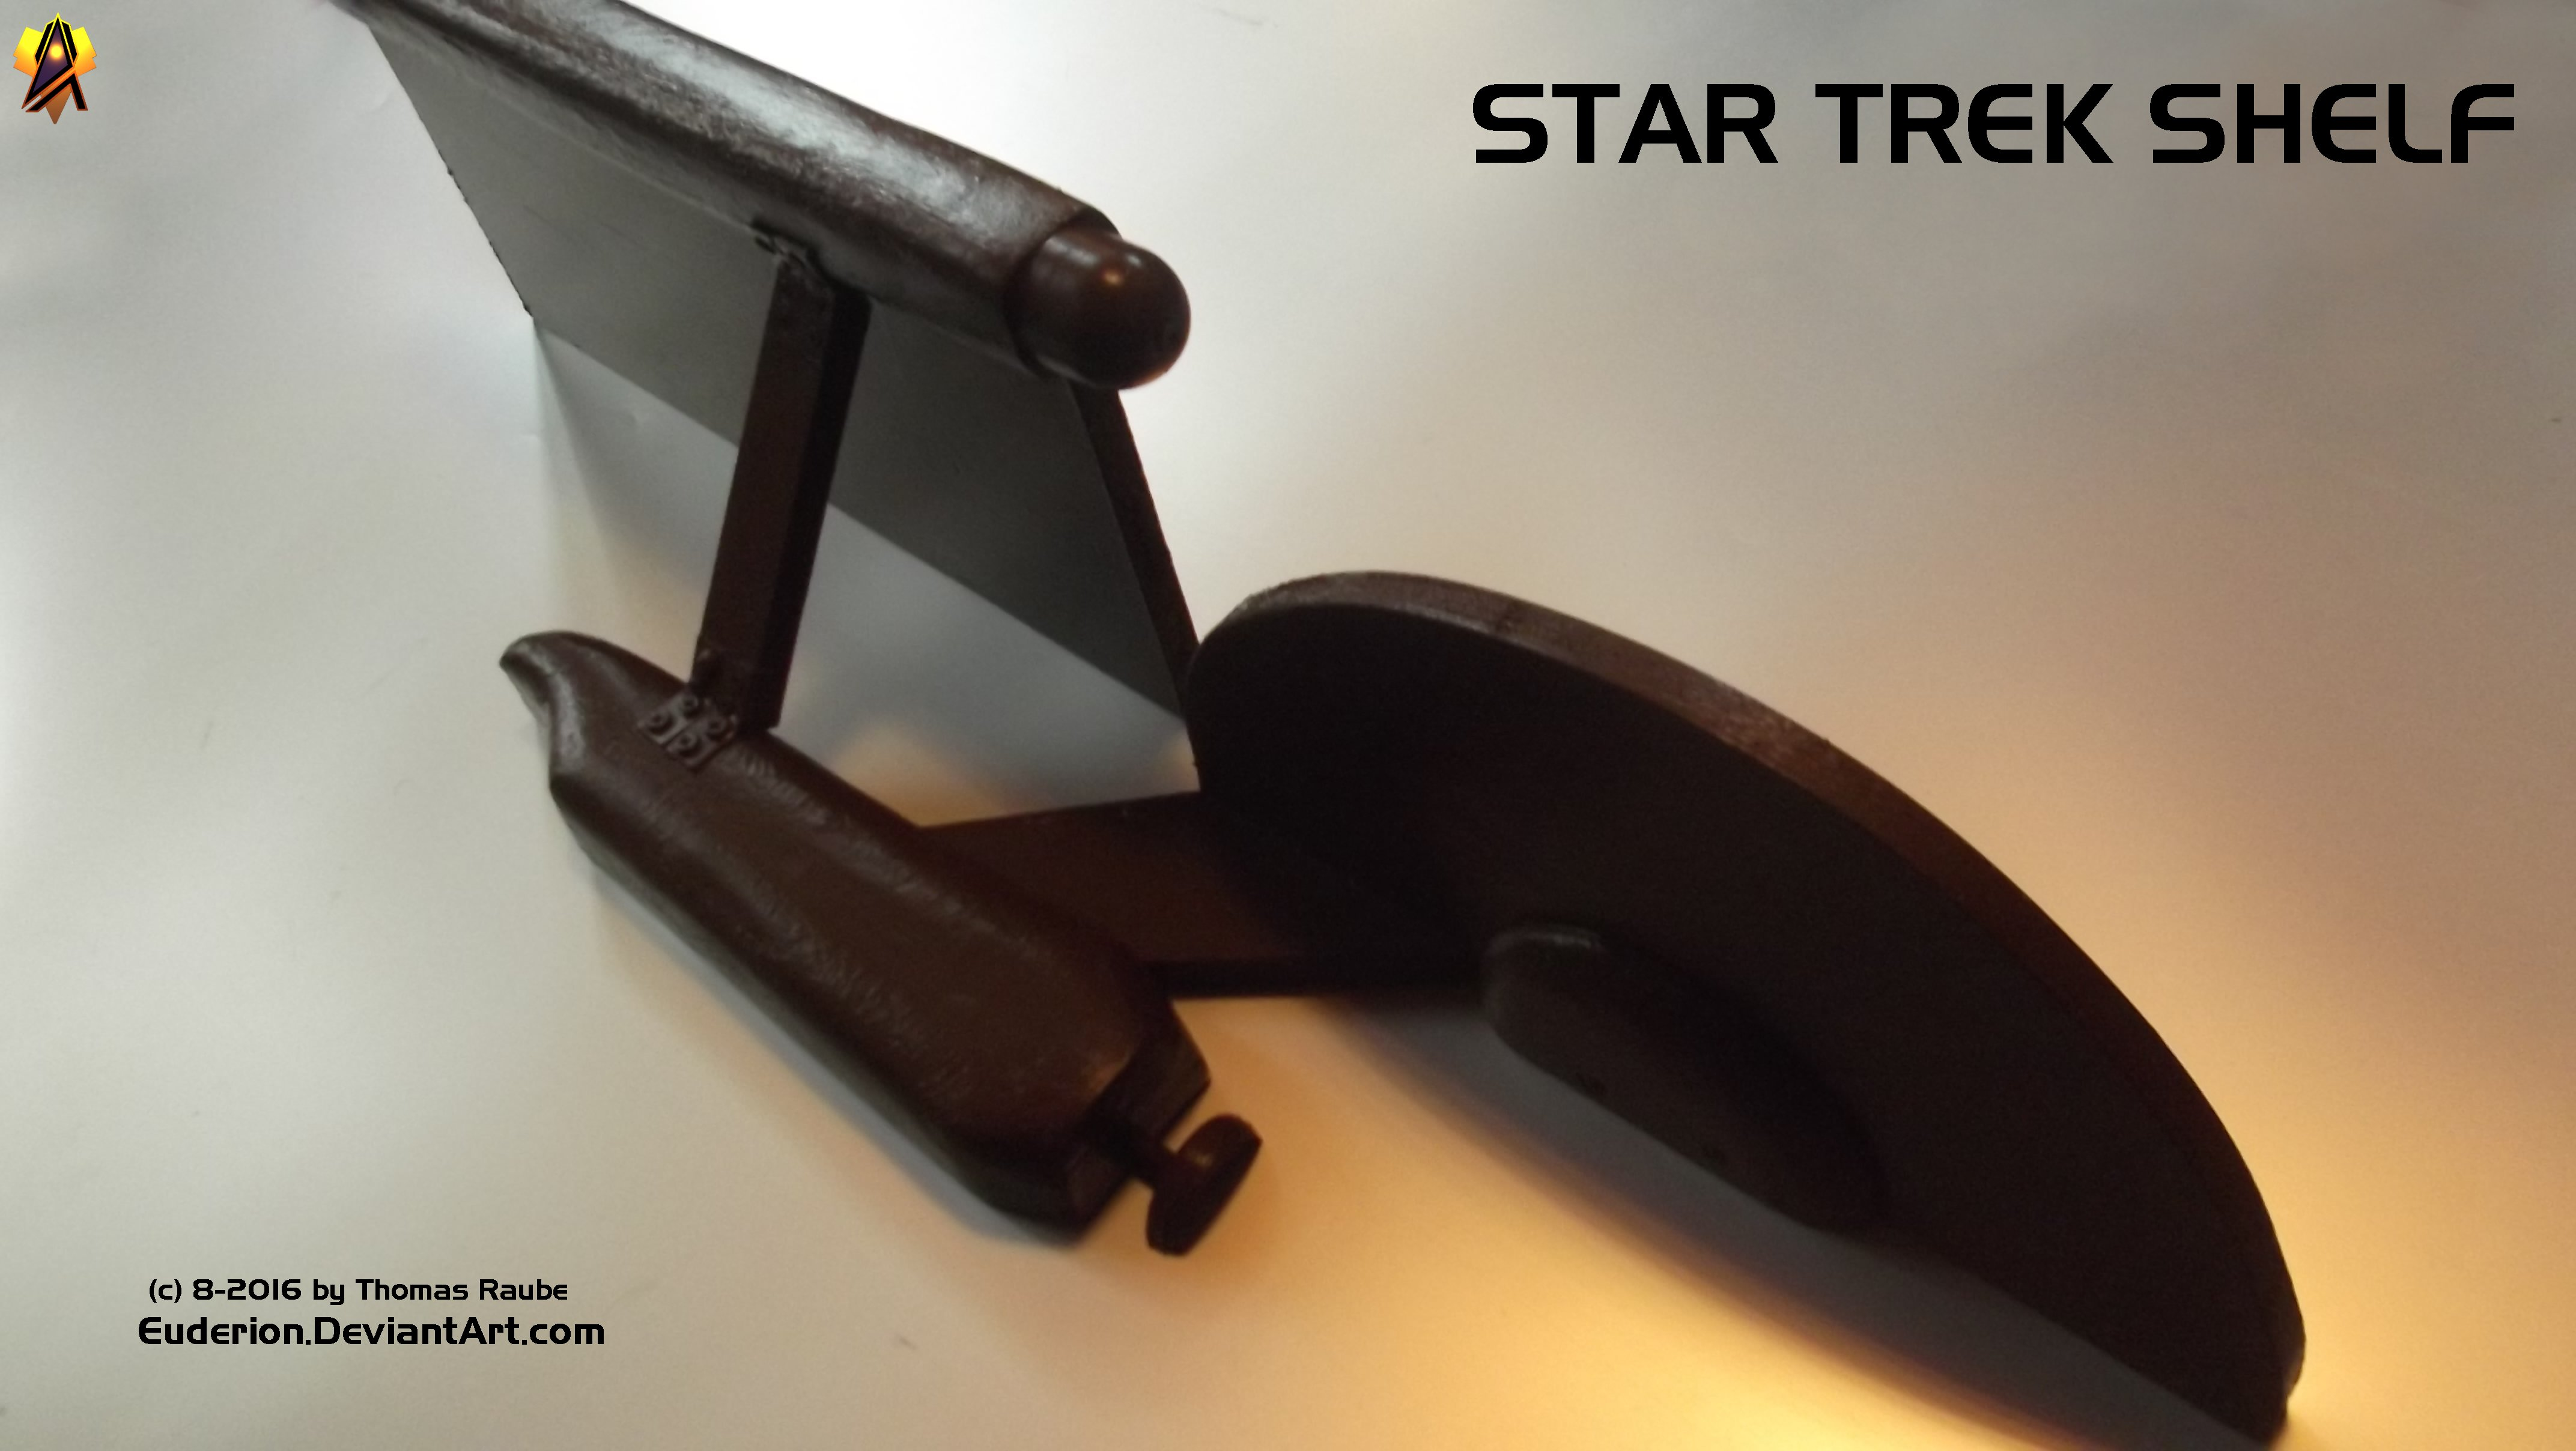 Star Trek Shelf 2 by Euderion